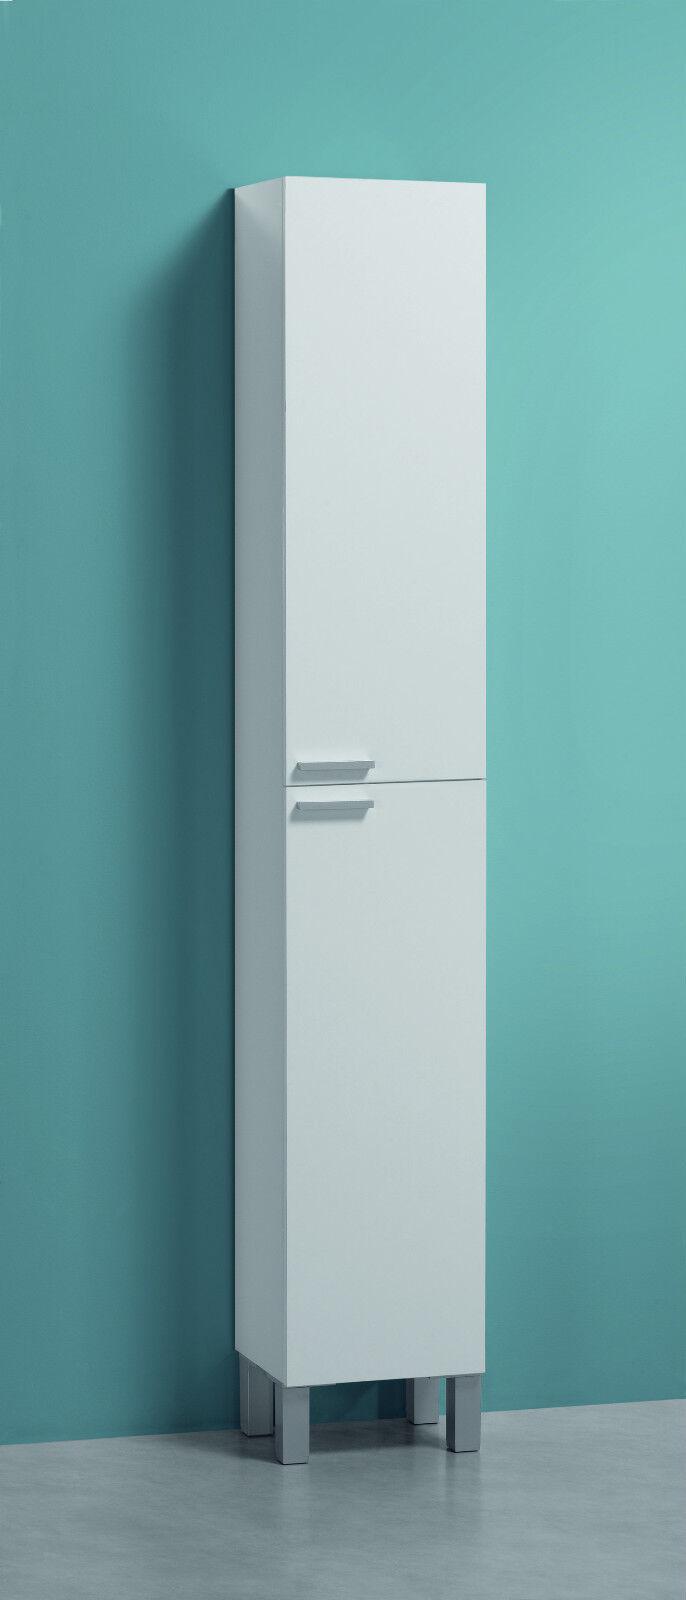 Koncept Tall Narrow Bathroom Cupboard Storage Cabinet Soft